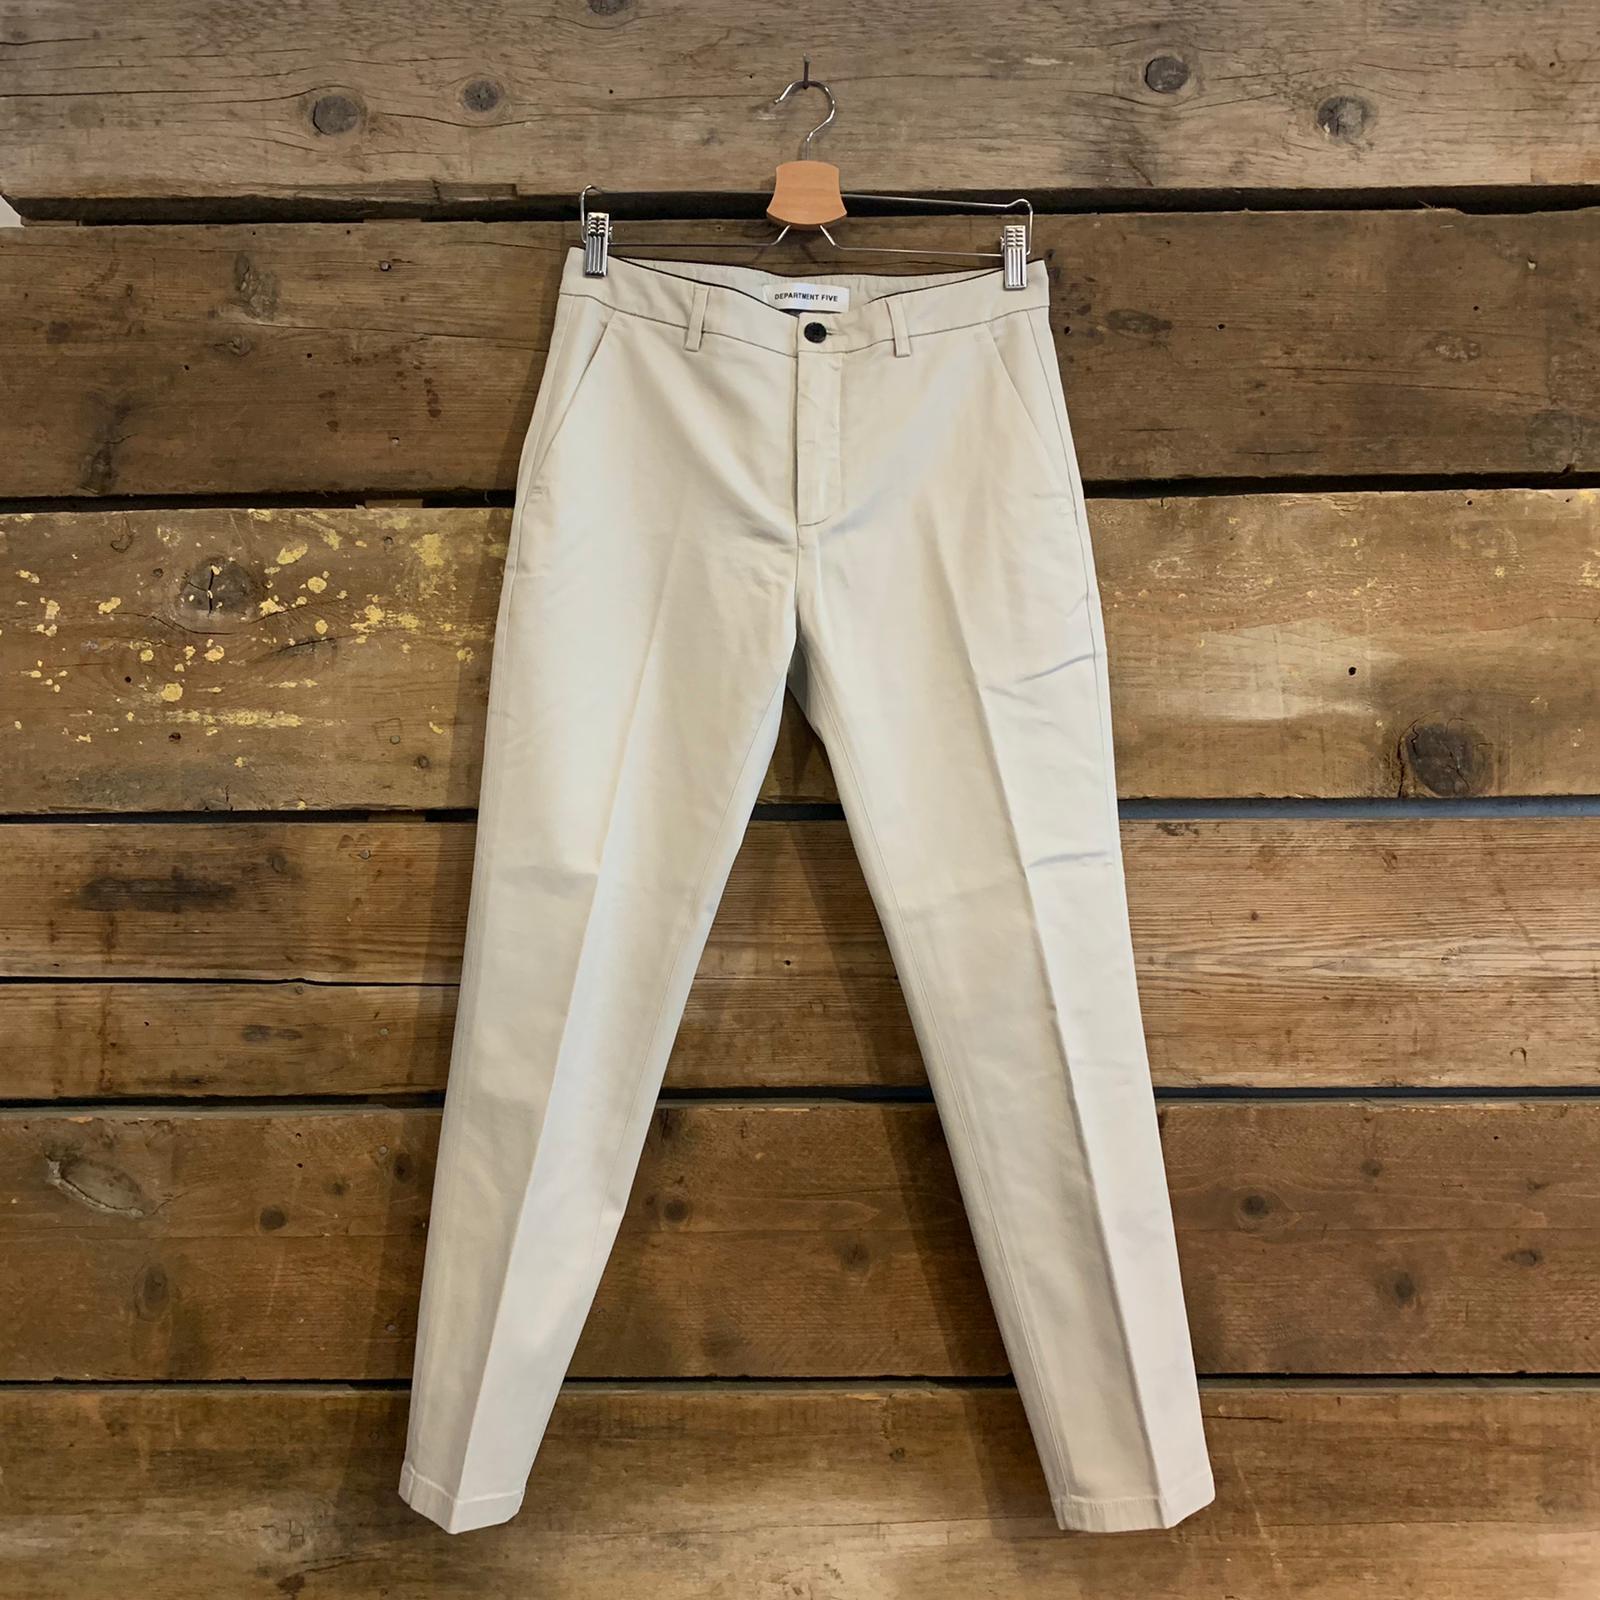 Pantalone Department 5 Prince Chinos Stucco